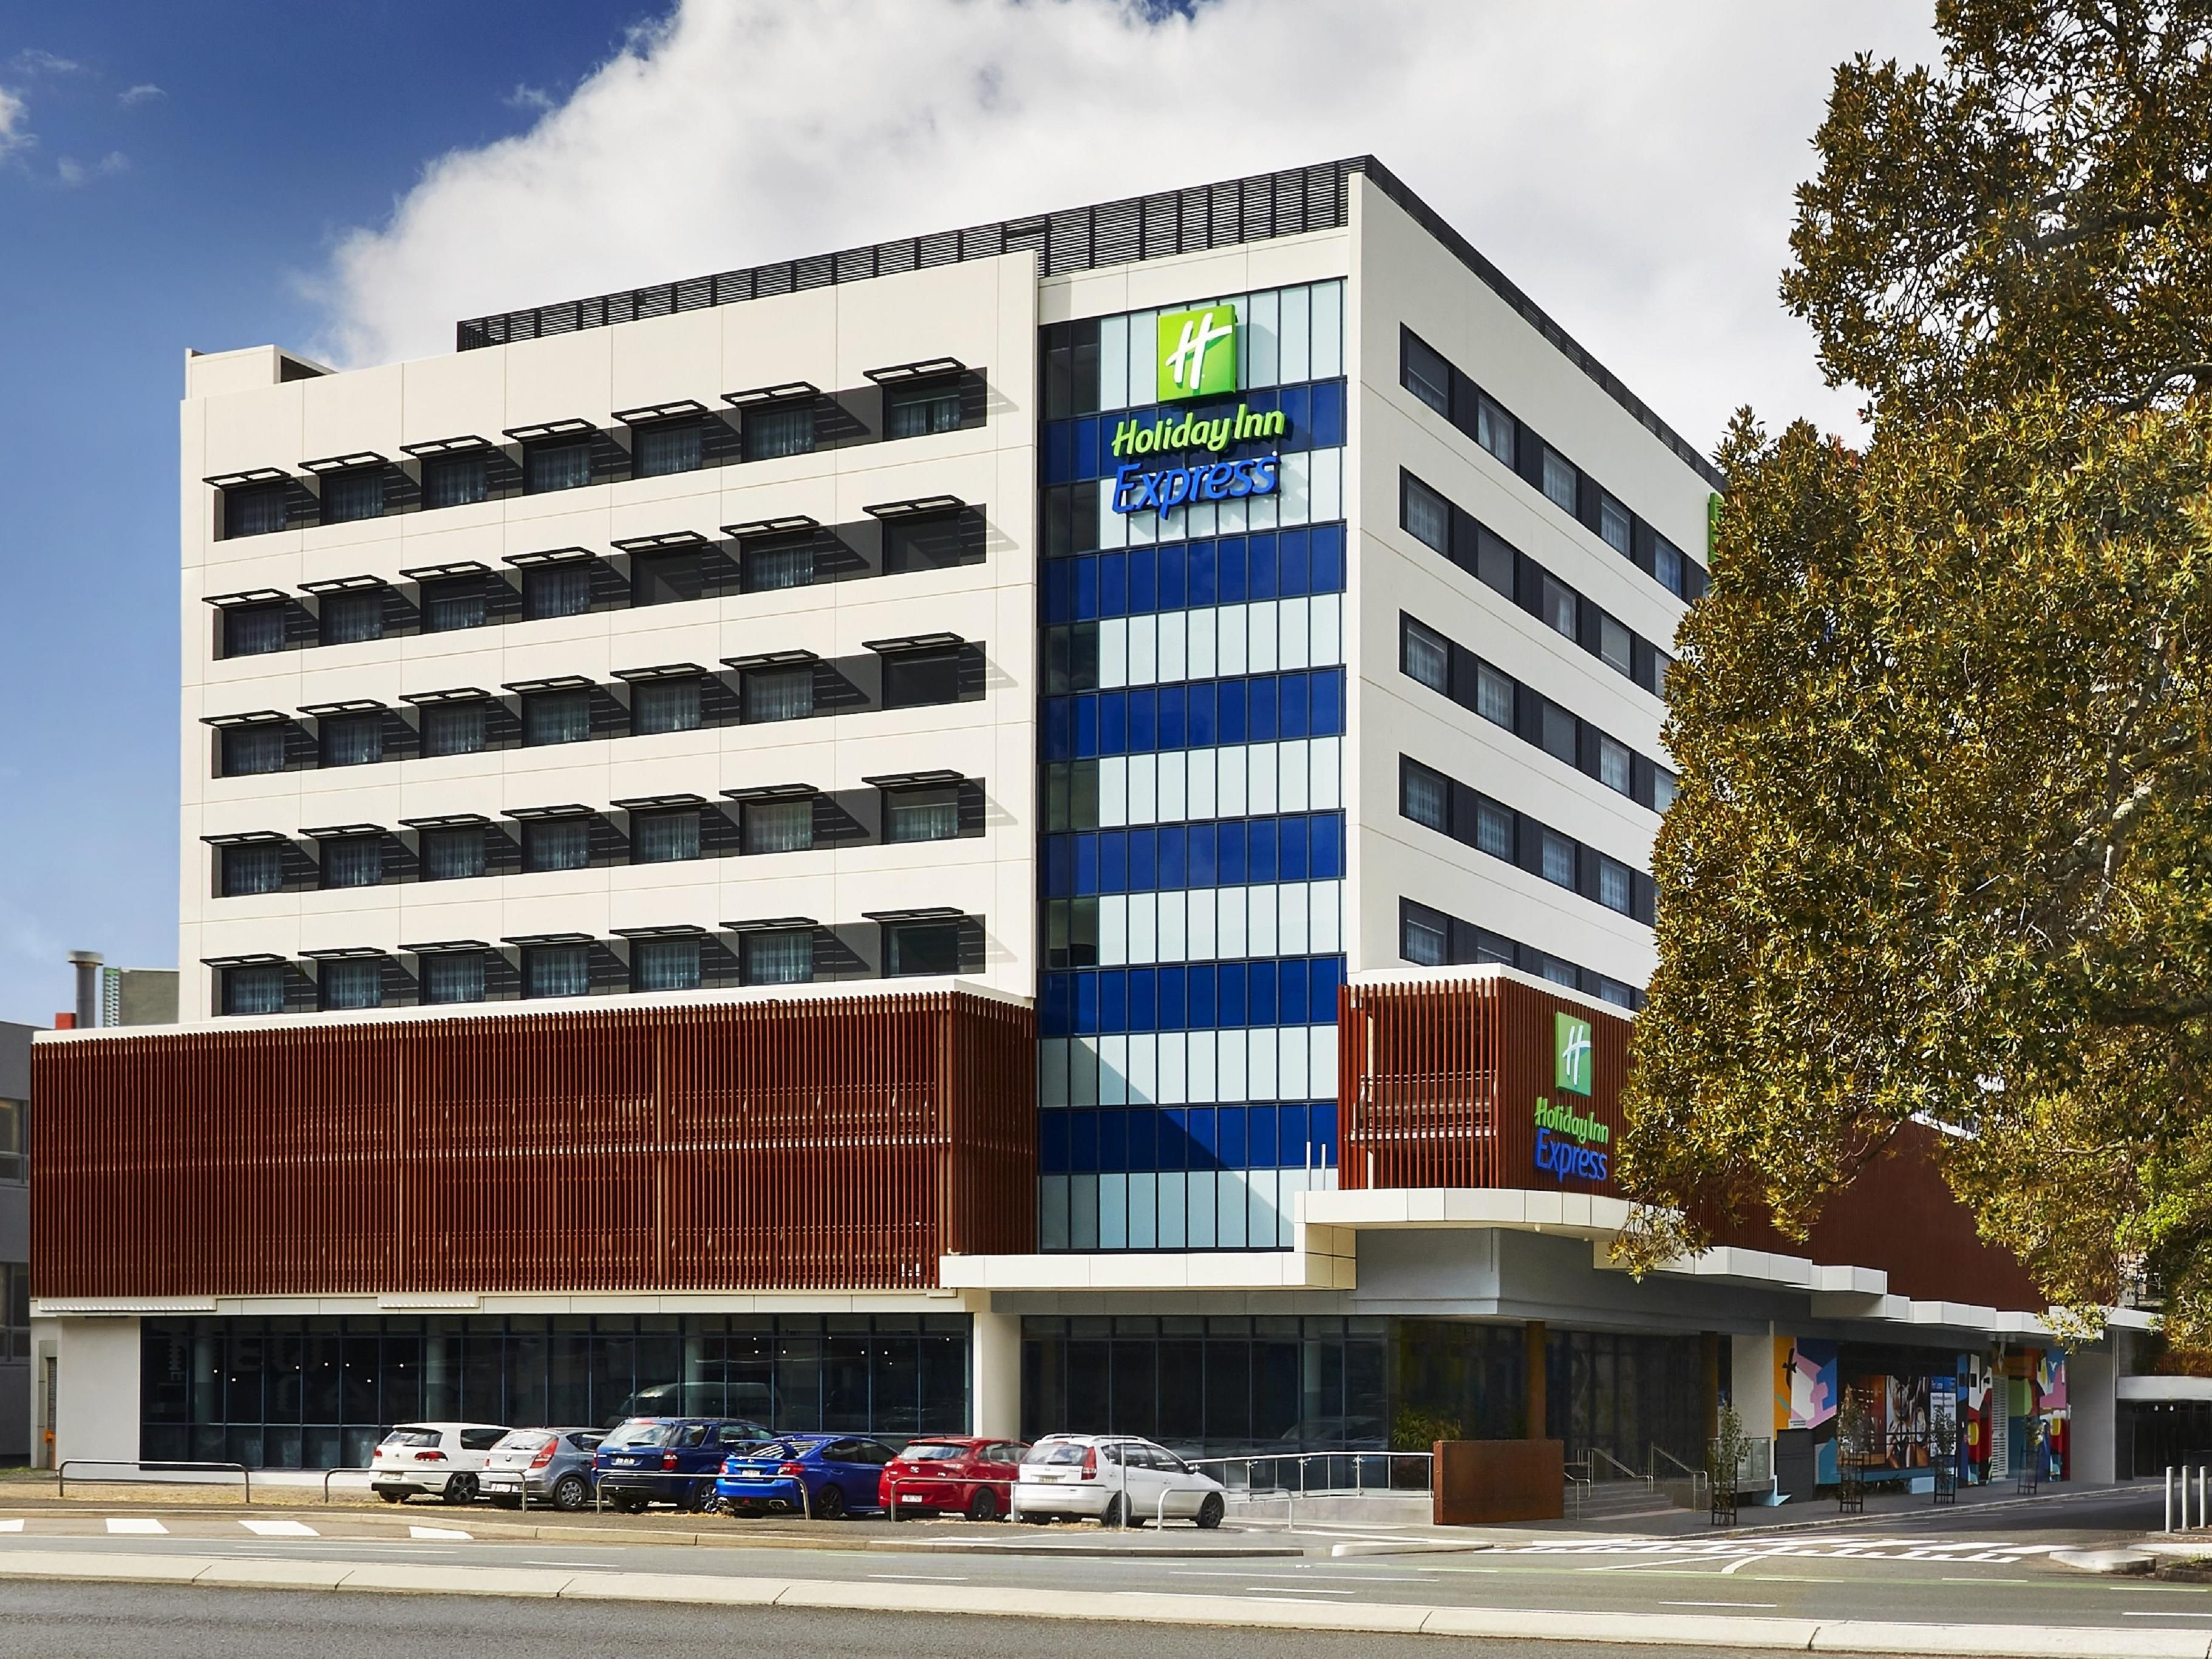 Holiday Inn Express Newcastle Australia Hotel Nsw 2302